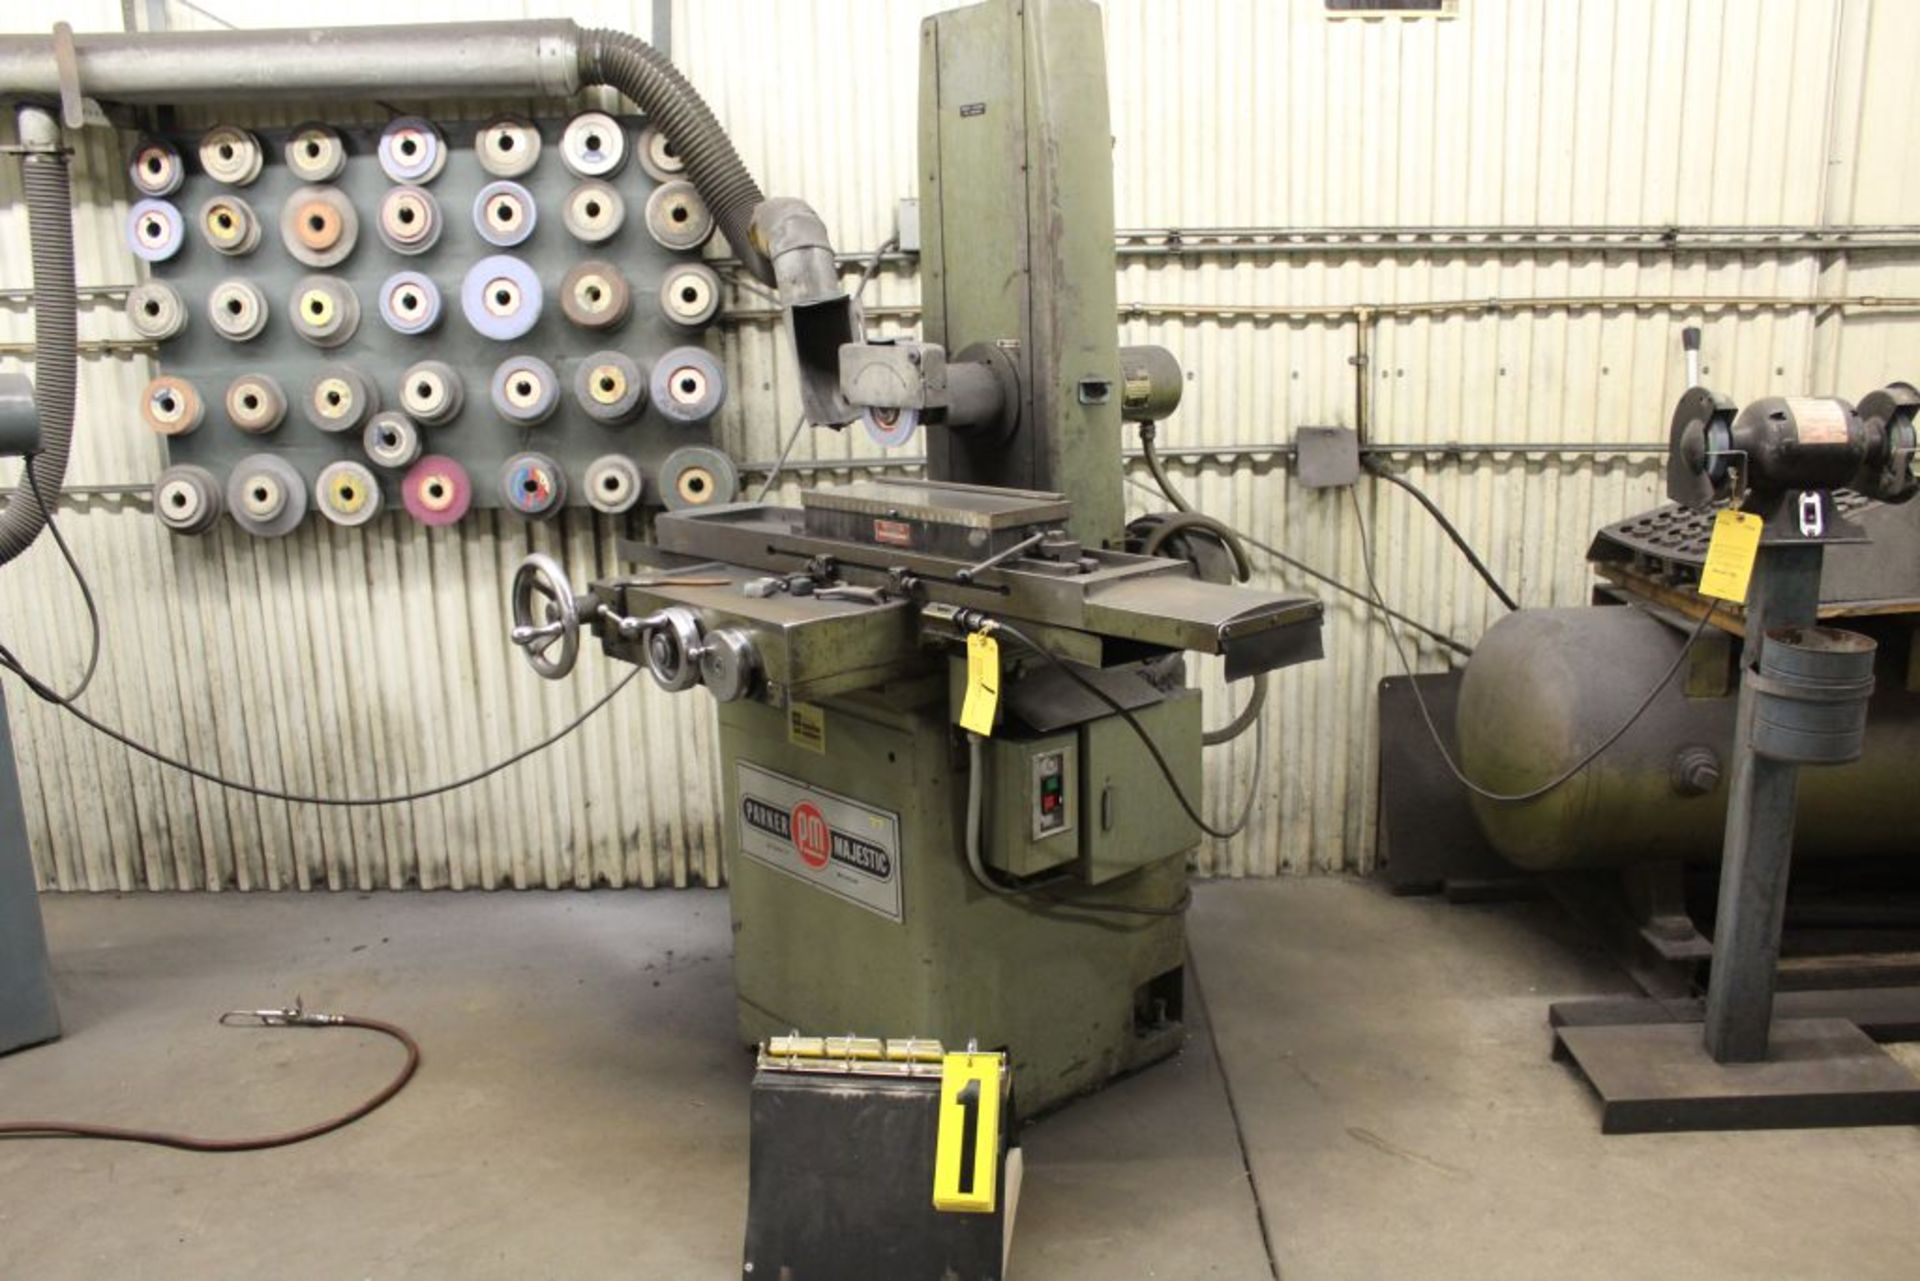 "Lot 001 - Parker Majestic surface grinder, model 1209-8, sn 43106, 6"", w/magnetool, 6"" x 18 table."